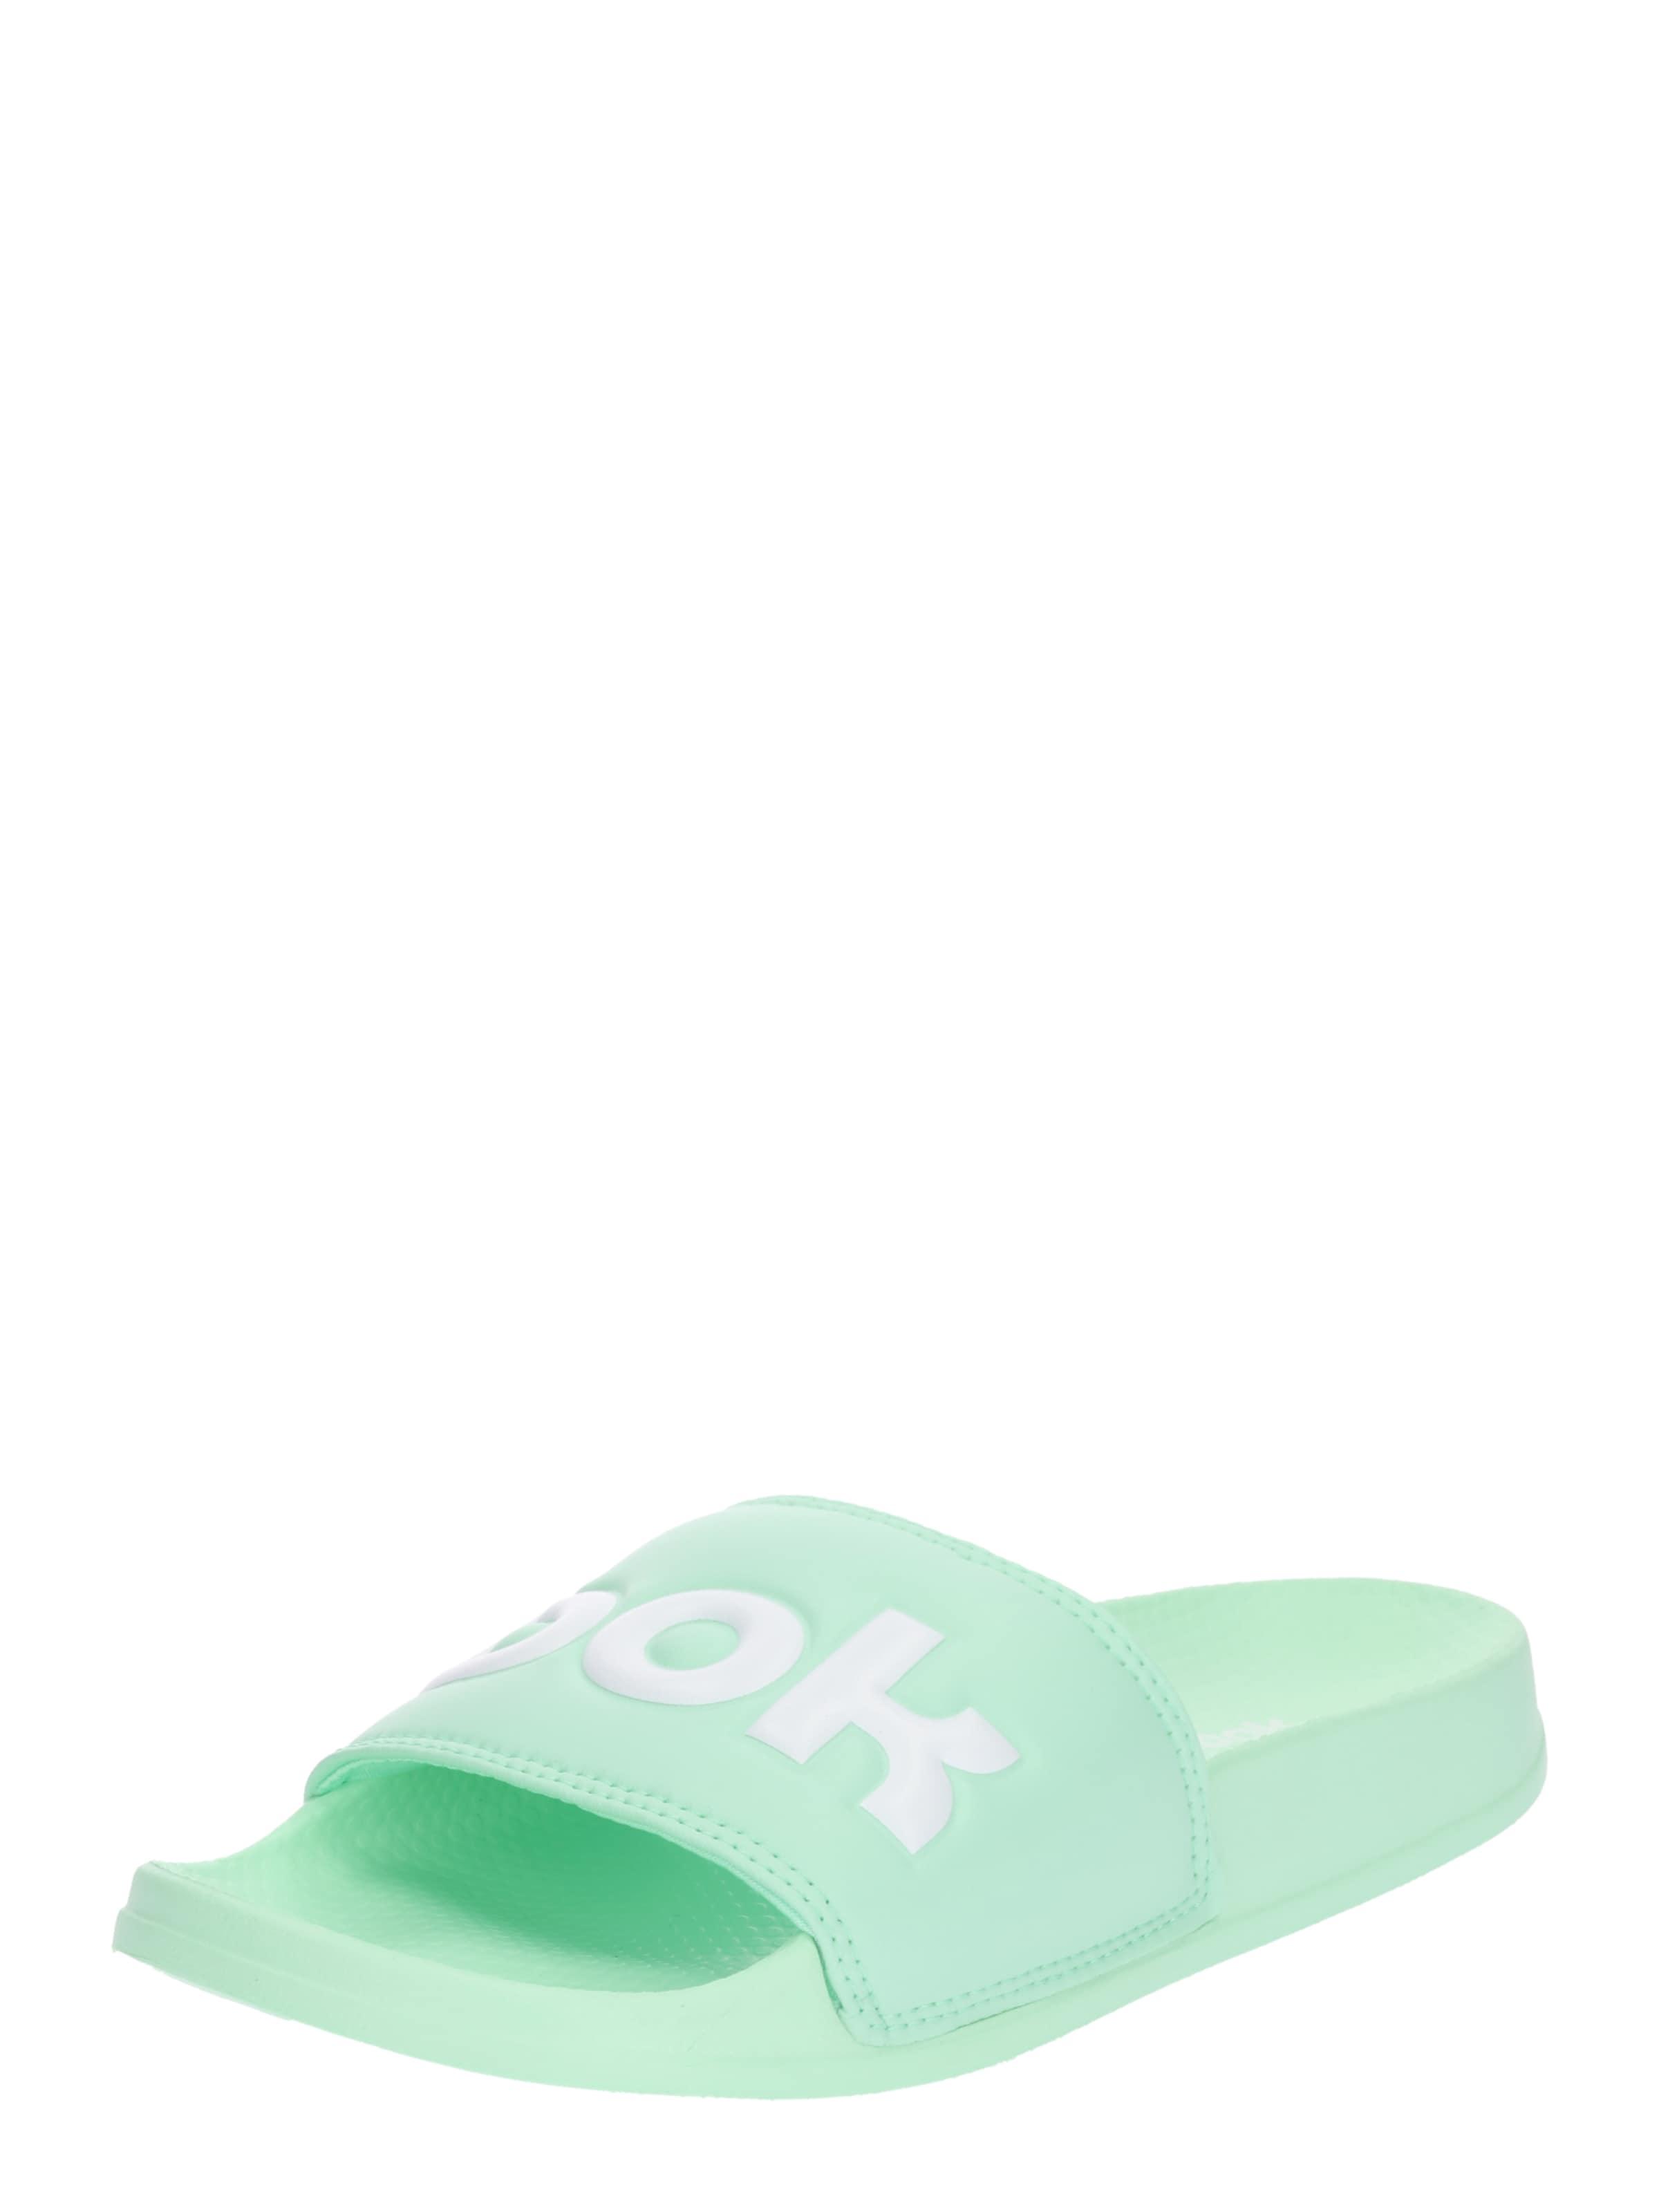 Haltbare classic Mode billige Schuhe Reebok classic Haltbare | Badelatschen 'Slid' Schuhe Gut getragene Schuhe 188b74